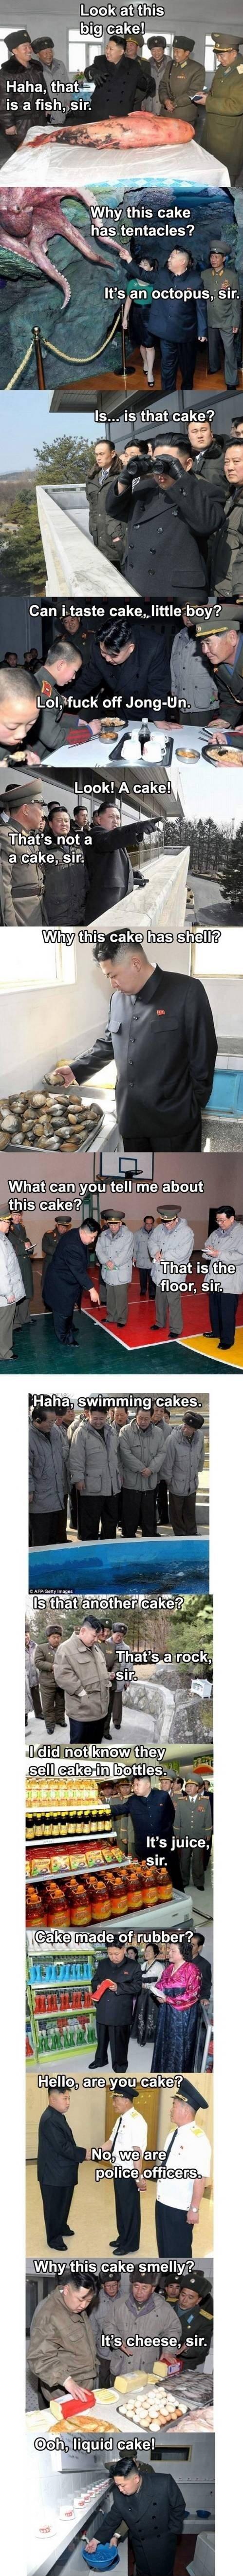 kim-jong-un-cake. no oc north korea, best korea.. Re post, best post kim-jong-un-cake no oc north korea best Re post